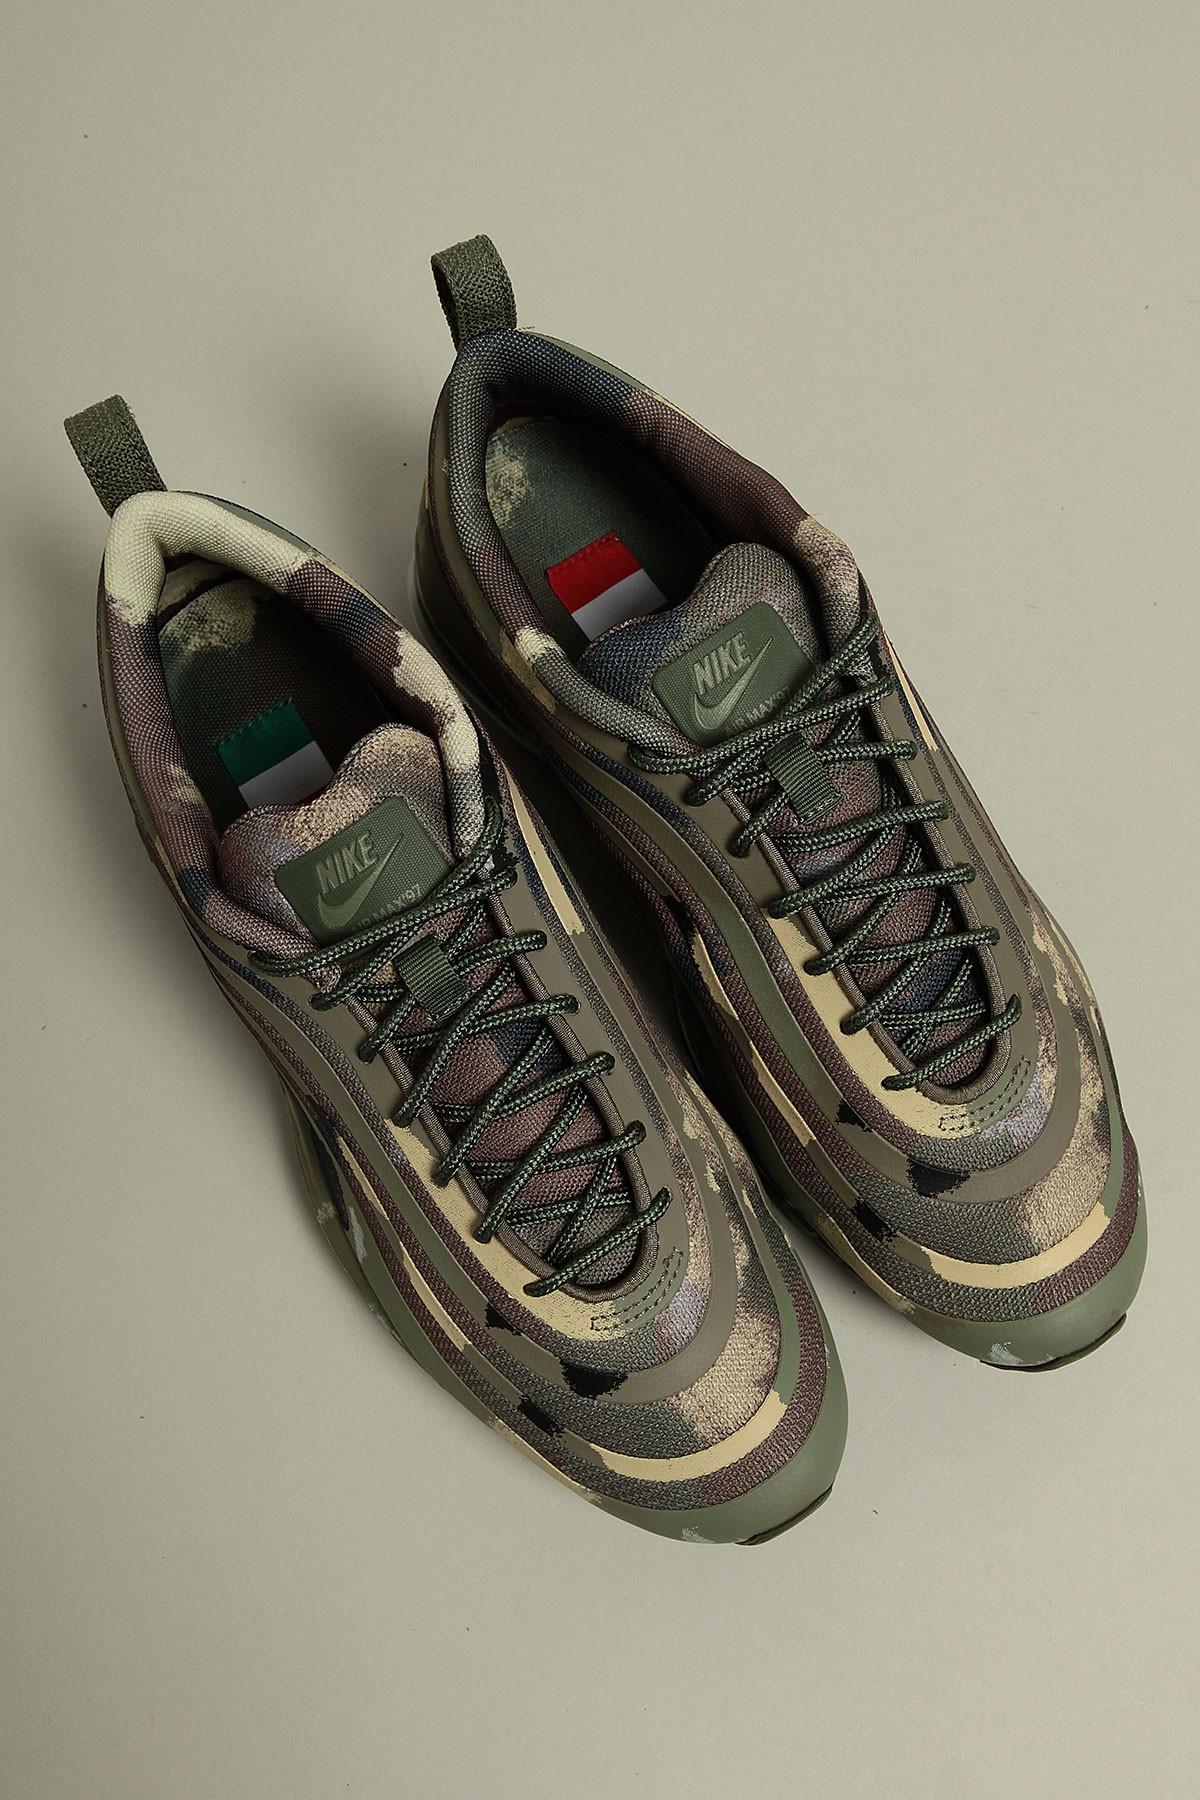 low priced e707f 6db76 Nike Air Max 95 SP Color  Dark Khaki Golden Tussah Khaki Style  596530-220